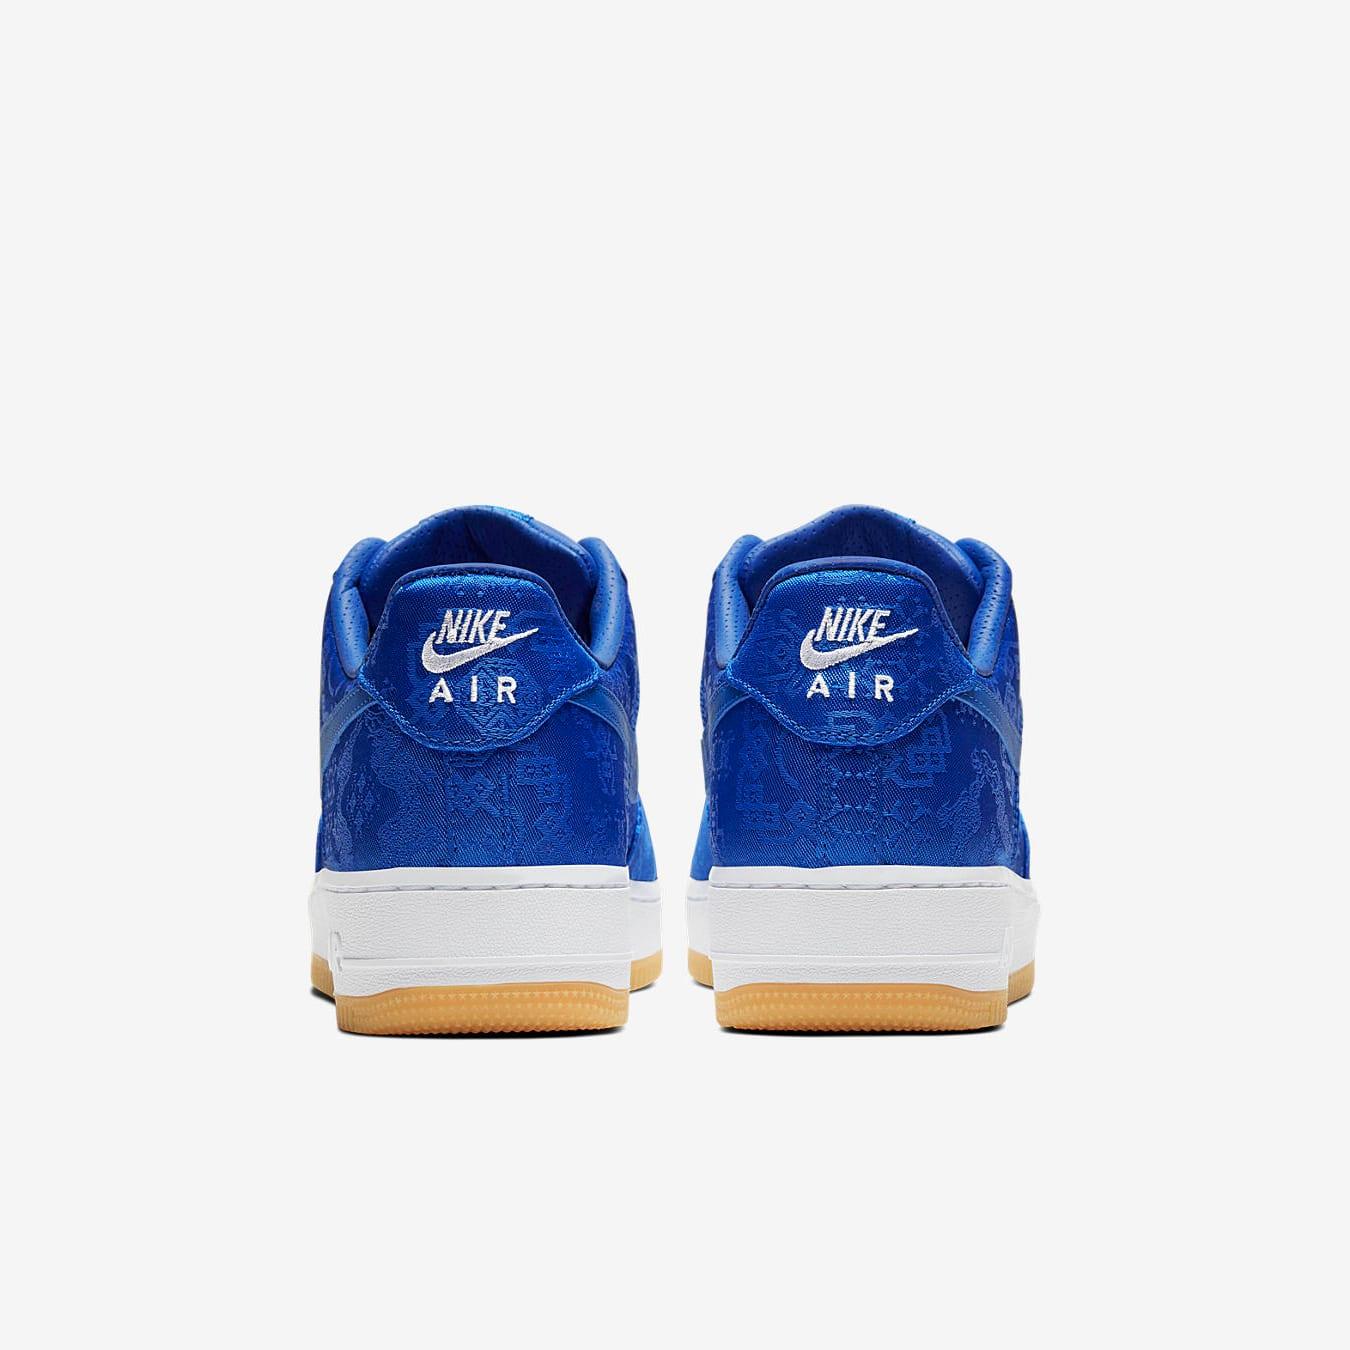 Nike x CLOT Air Force 1 Premium - CJ5290-400